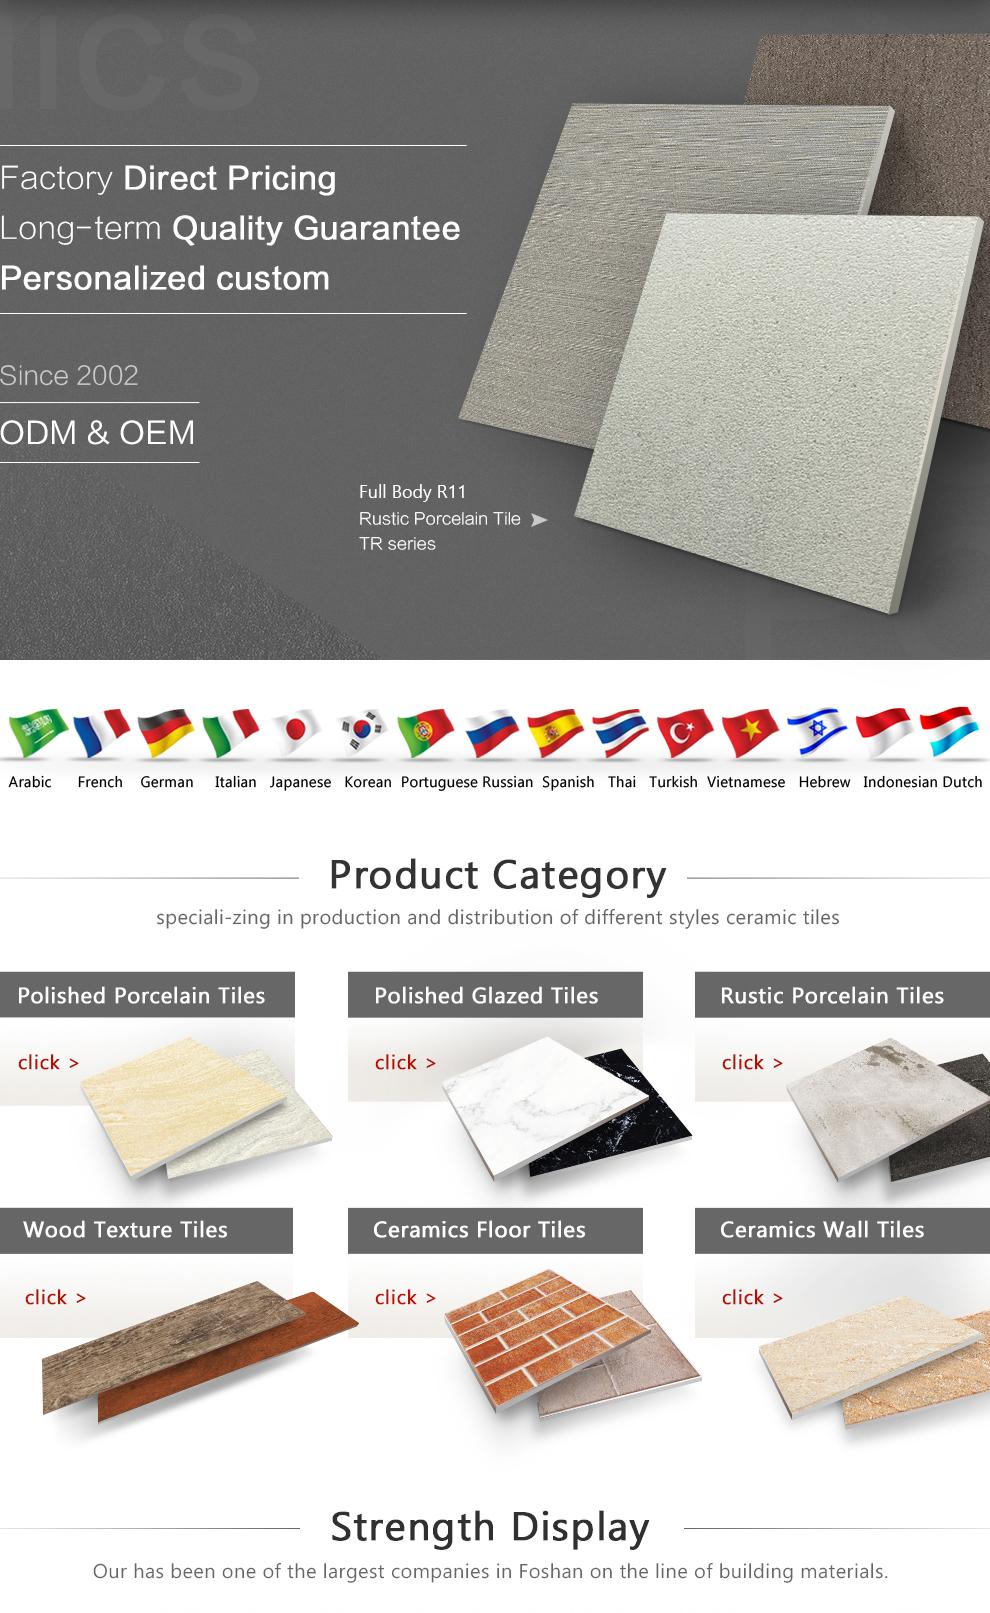 foshan artist ceramics co., ltd. - ceramic tiles,polished tiles